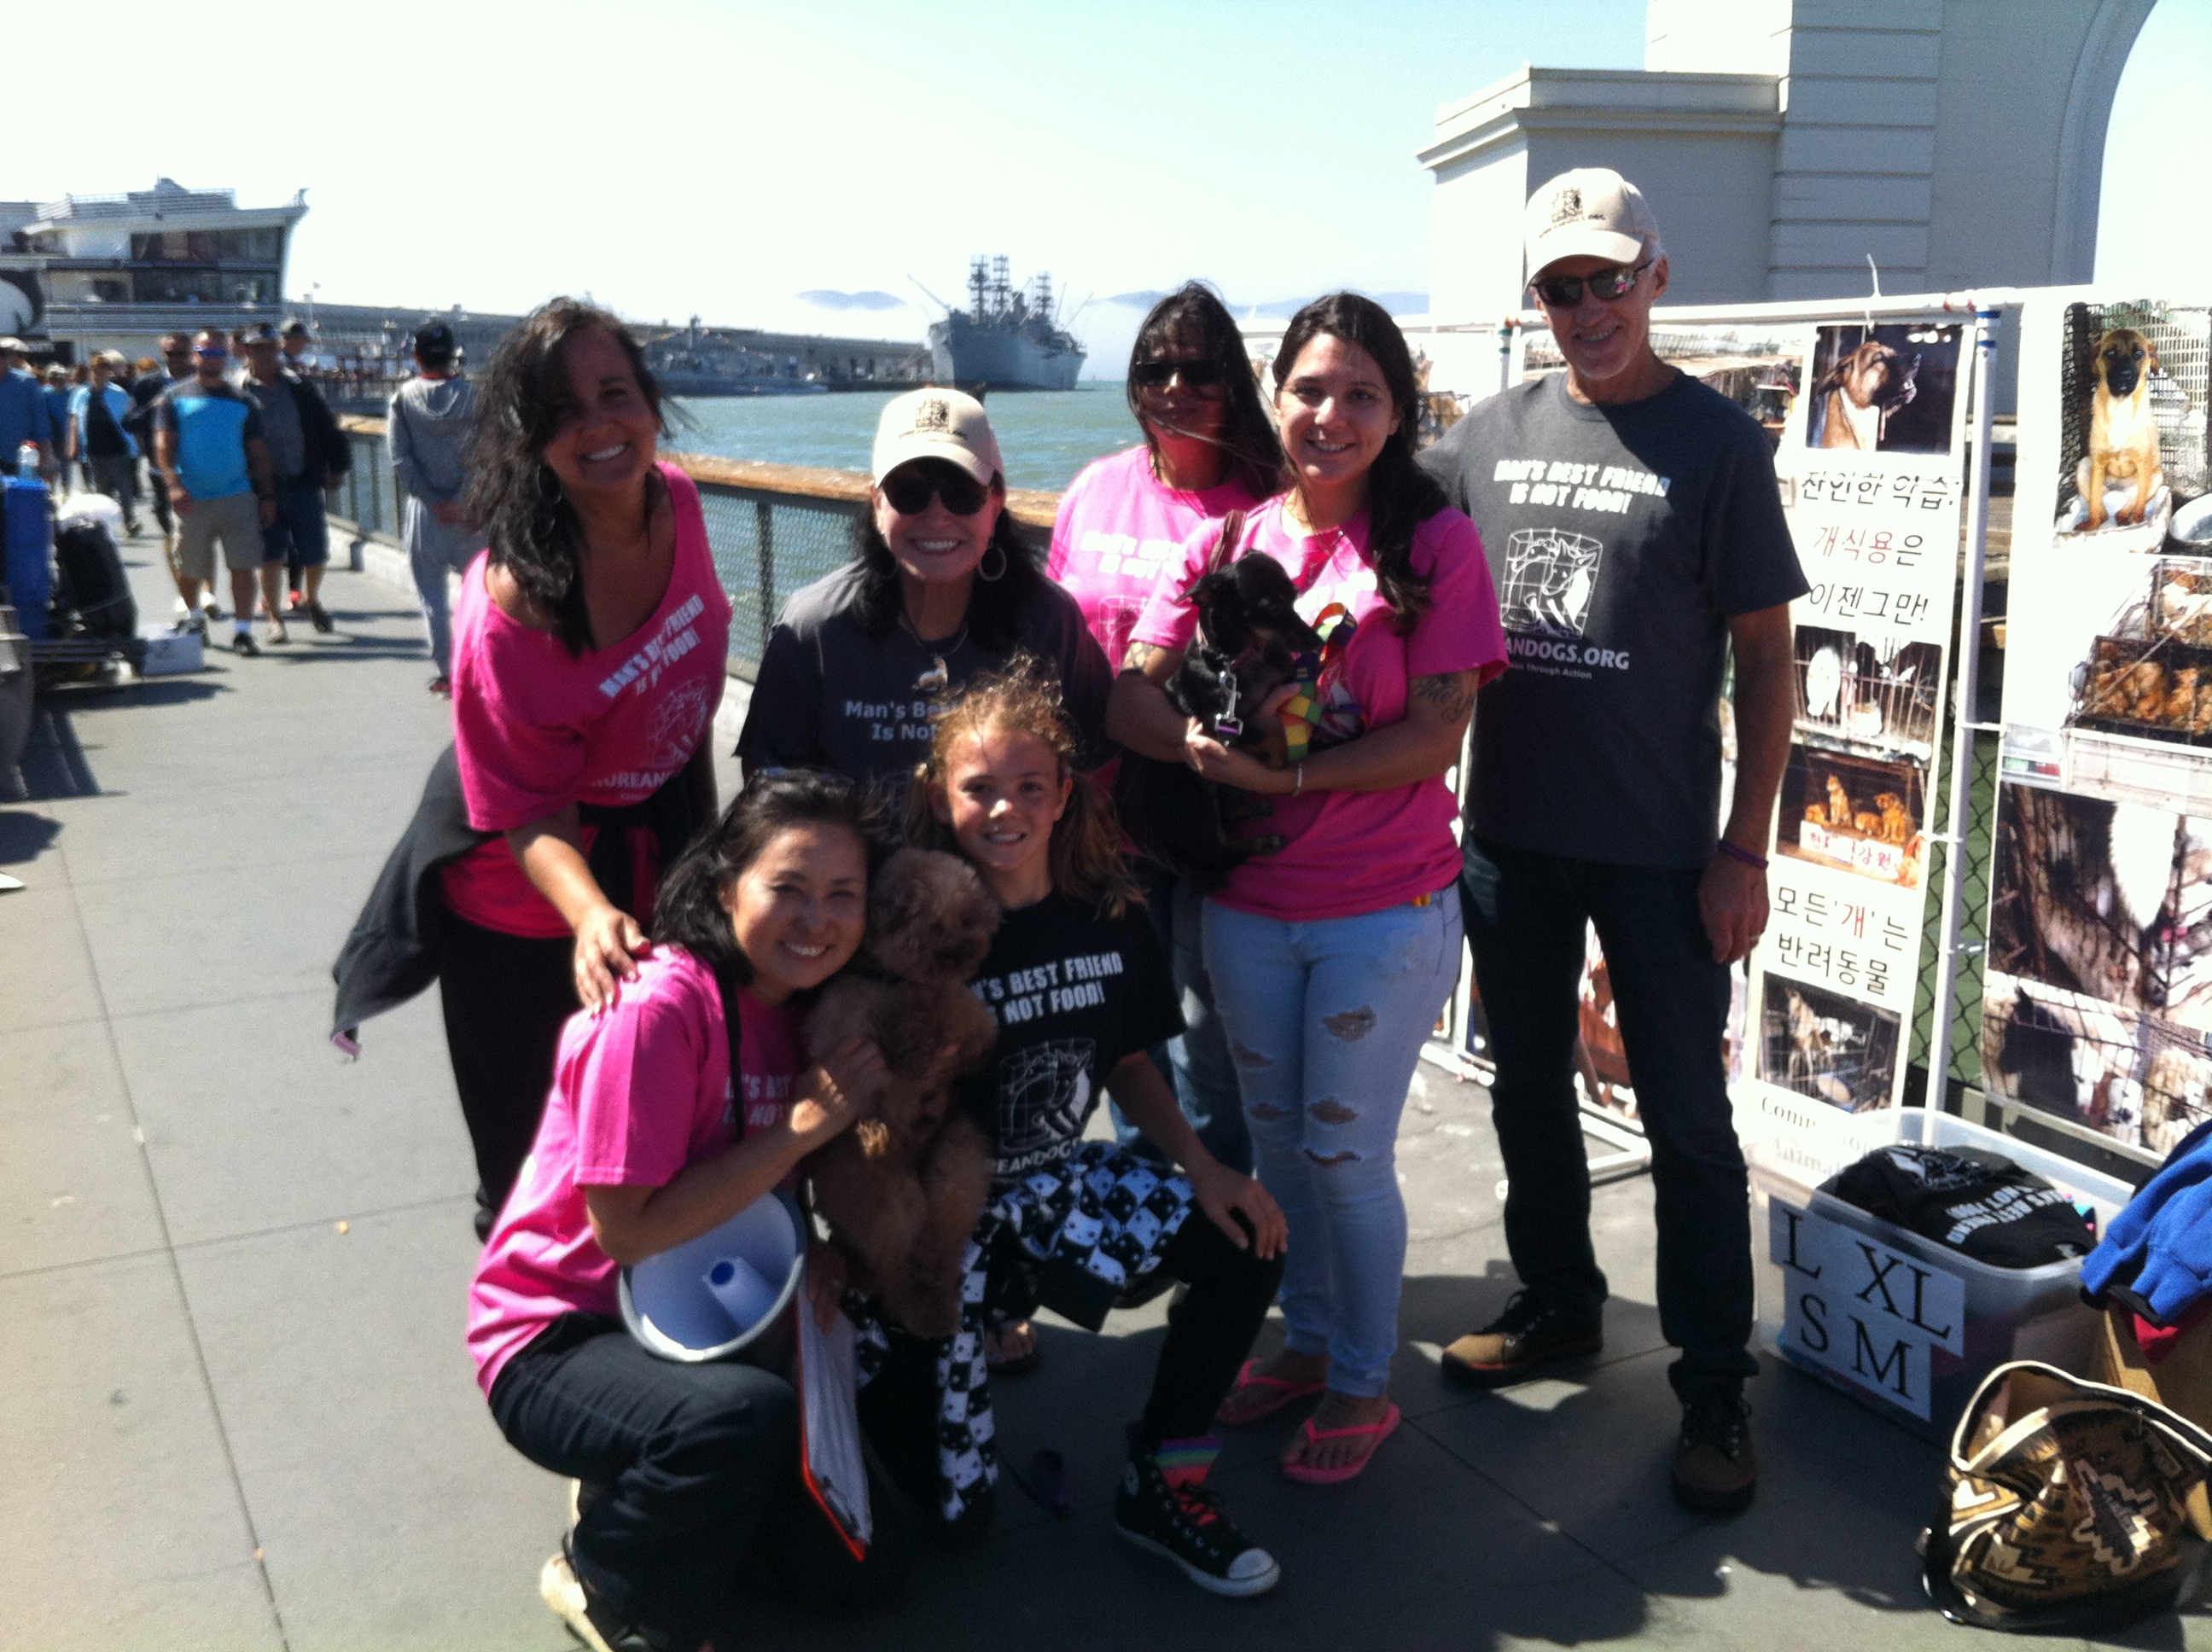 October 21, 2017 Saturday - Fisherman's Wharf, San Francisco, California